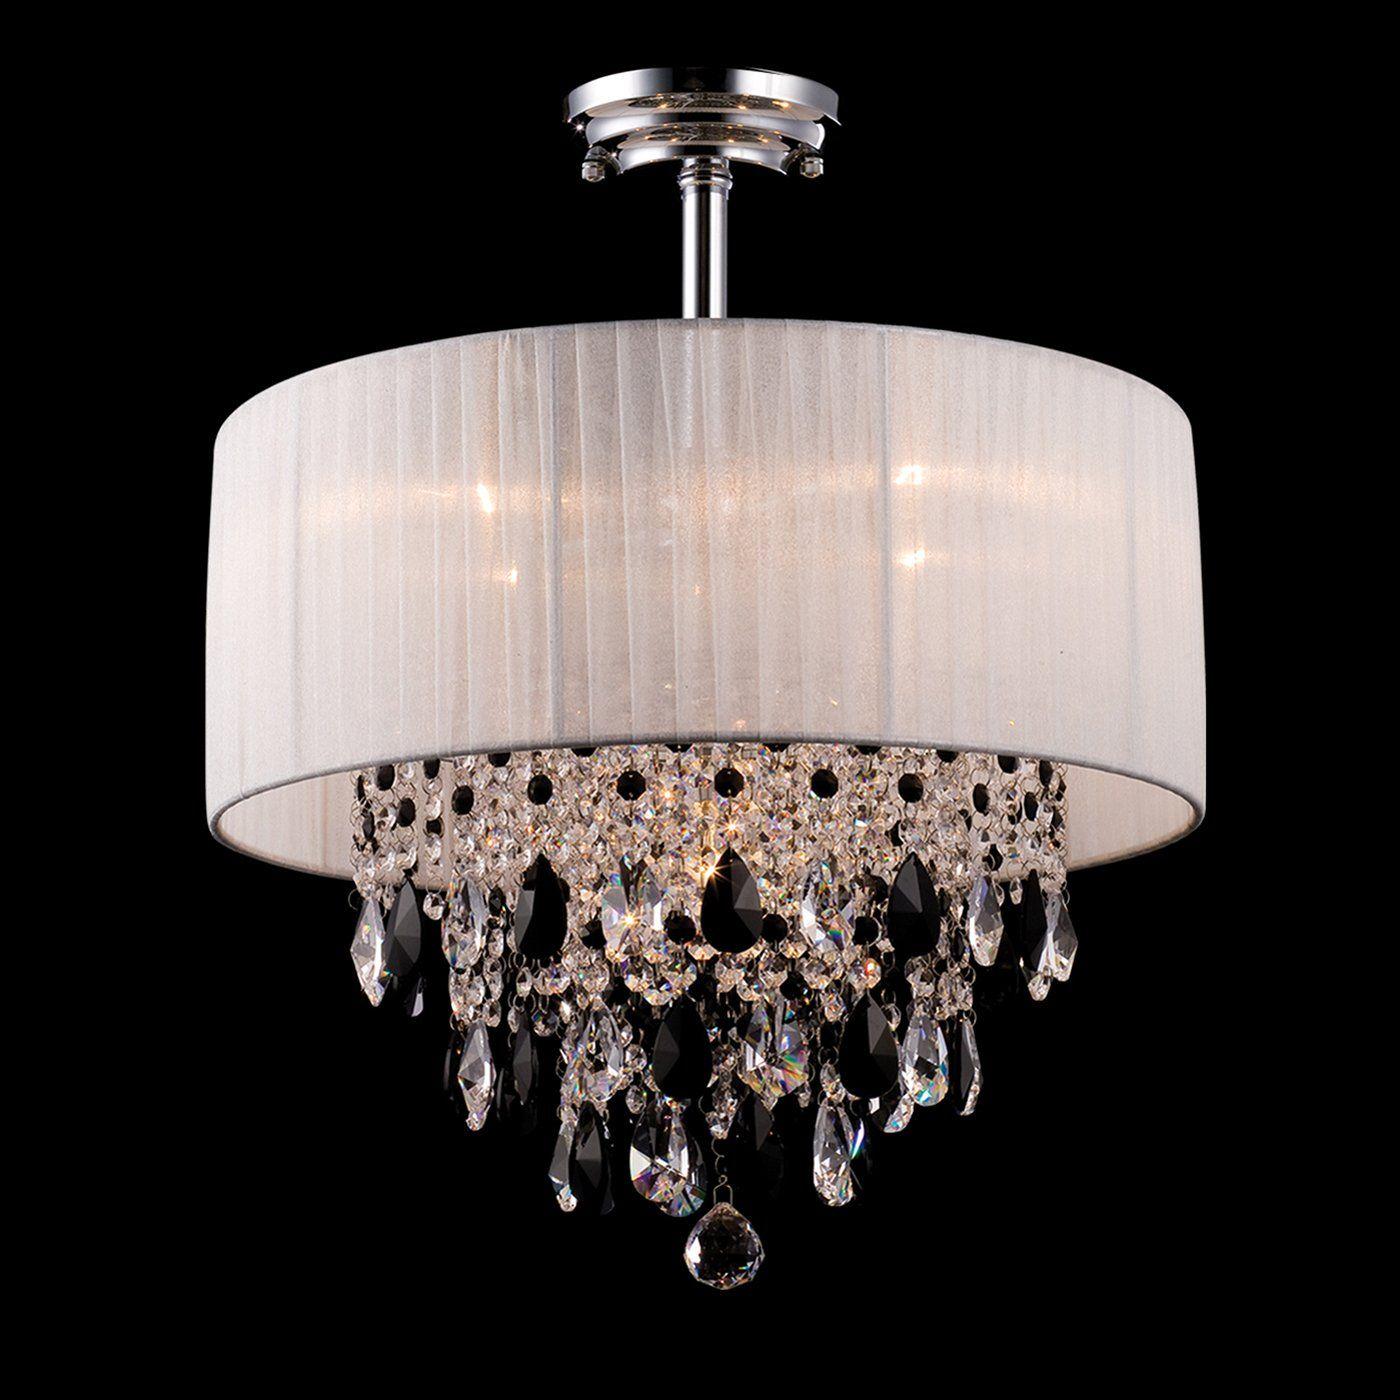 Dale tiffany gh90053 5 light west beckham mini chandelier polished dale tiffany gh90053 5 light west beckham mini chandelier polished chrome aloadofball Gallery